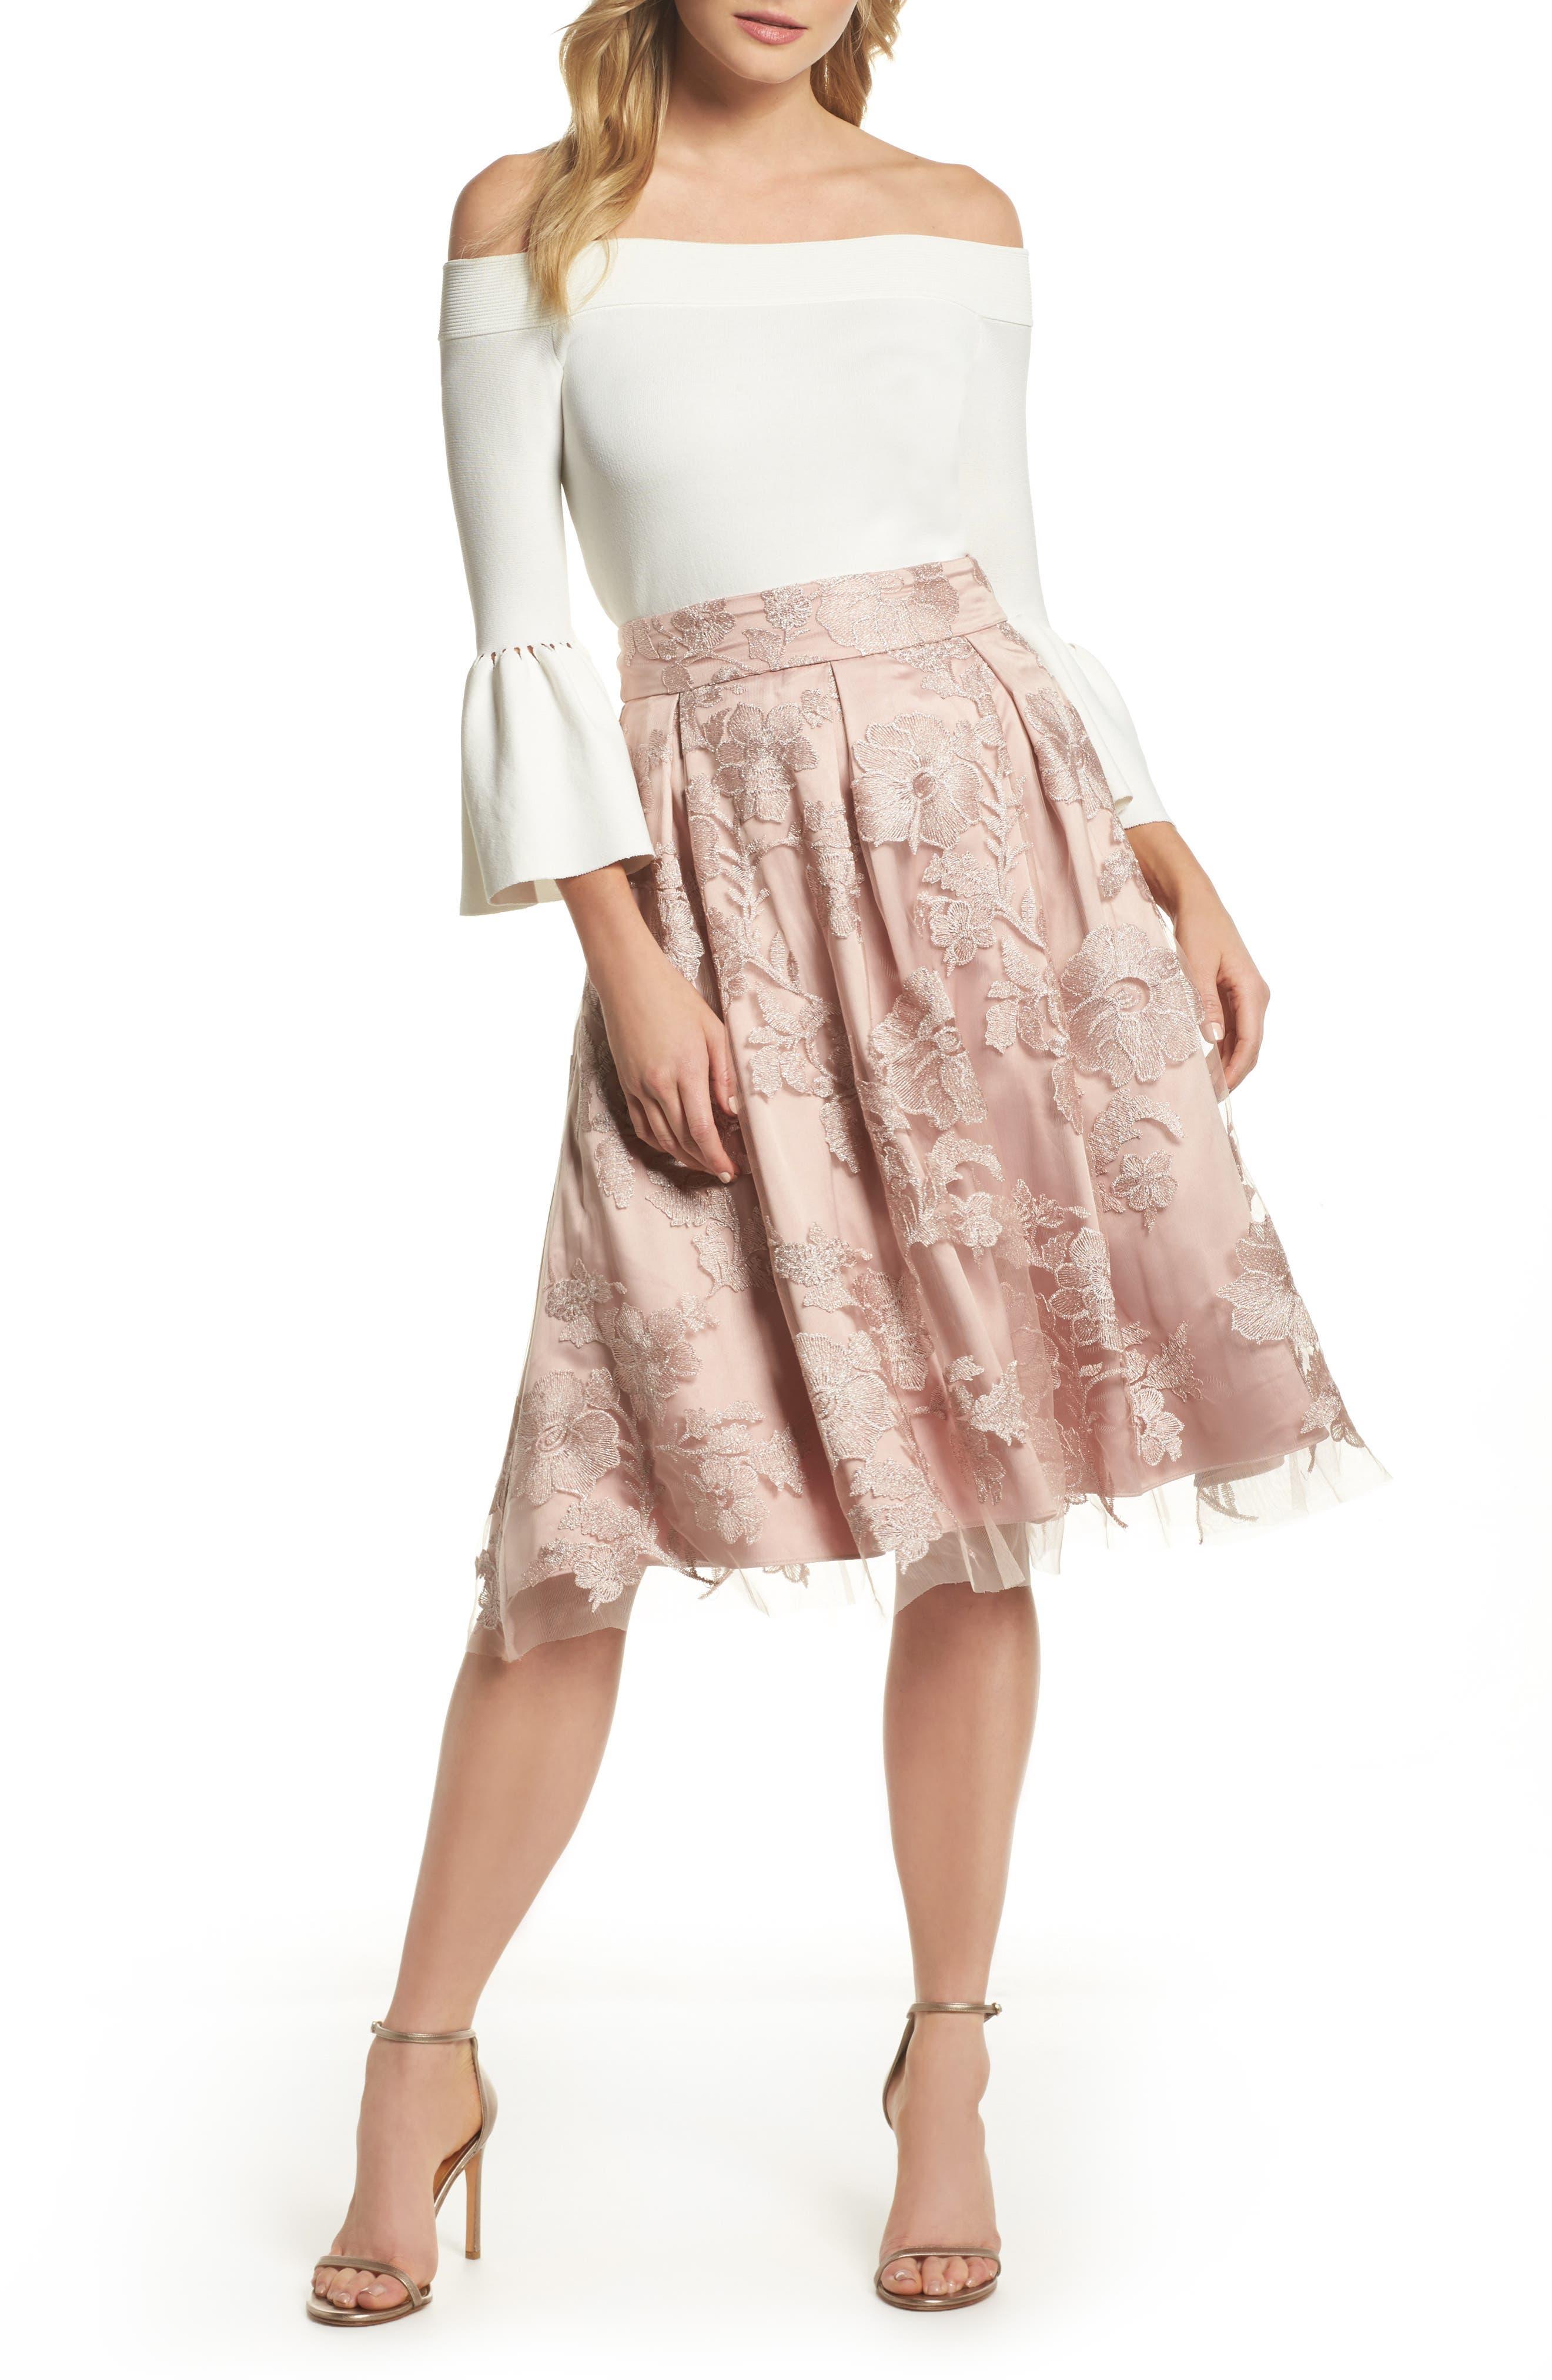 Floral Embroidered Skirt,                             Alternate thumbnail 10, color,                             Blush